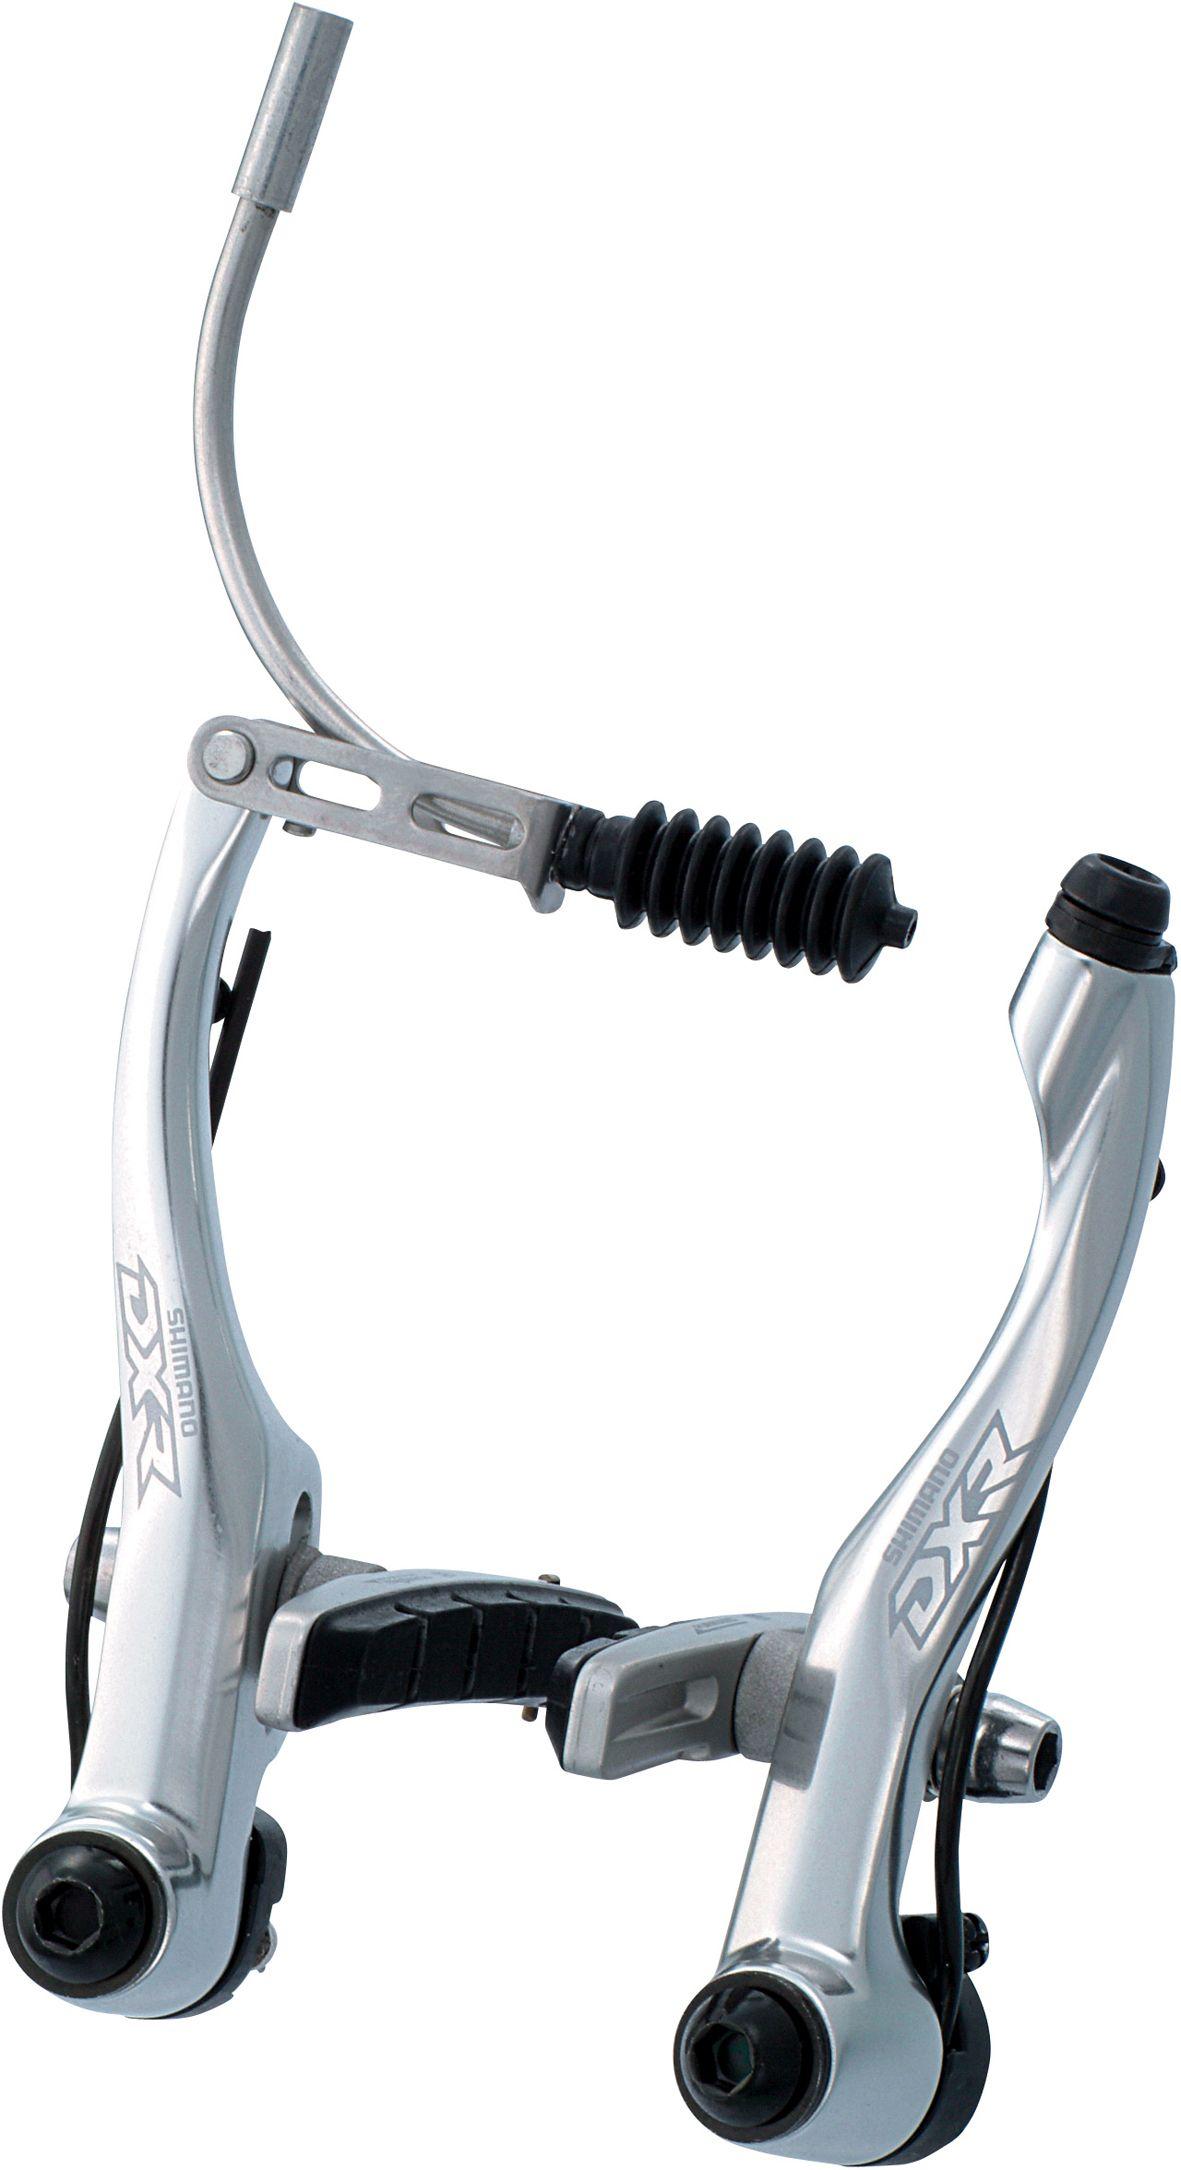 dxr racing chair portable walking shimano v brake